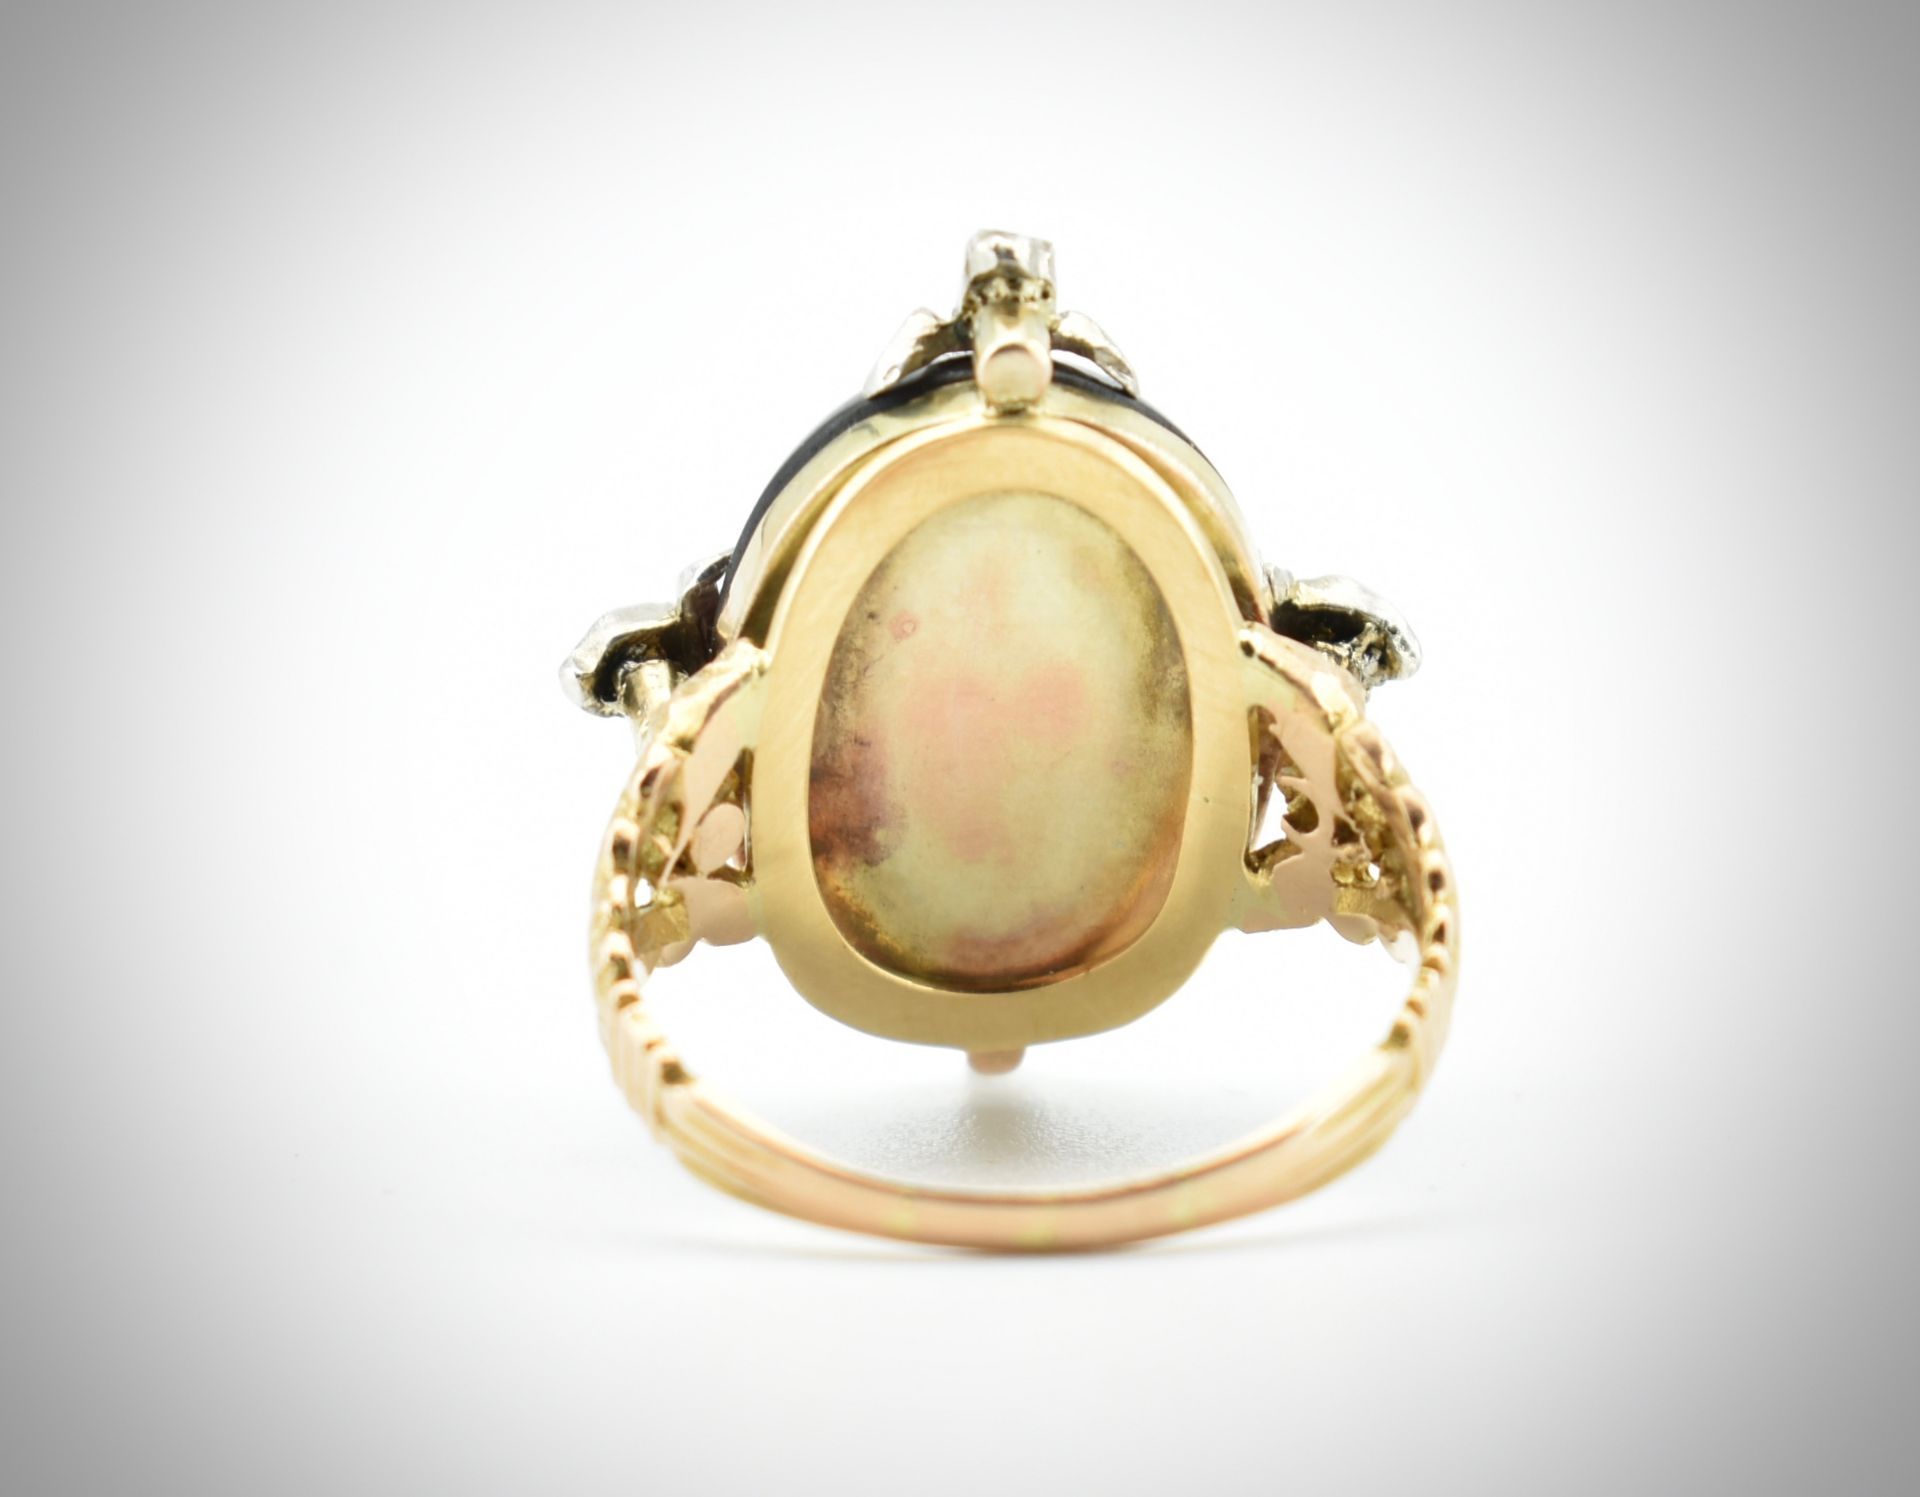 Antique Garnet & Diamond Ring. - Image 2 of 3